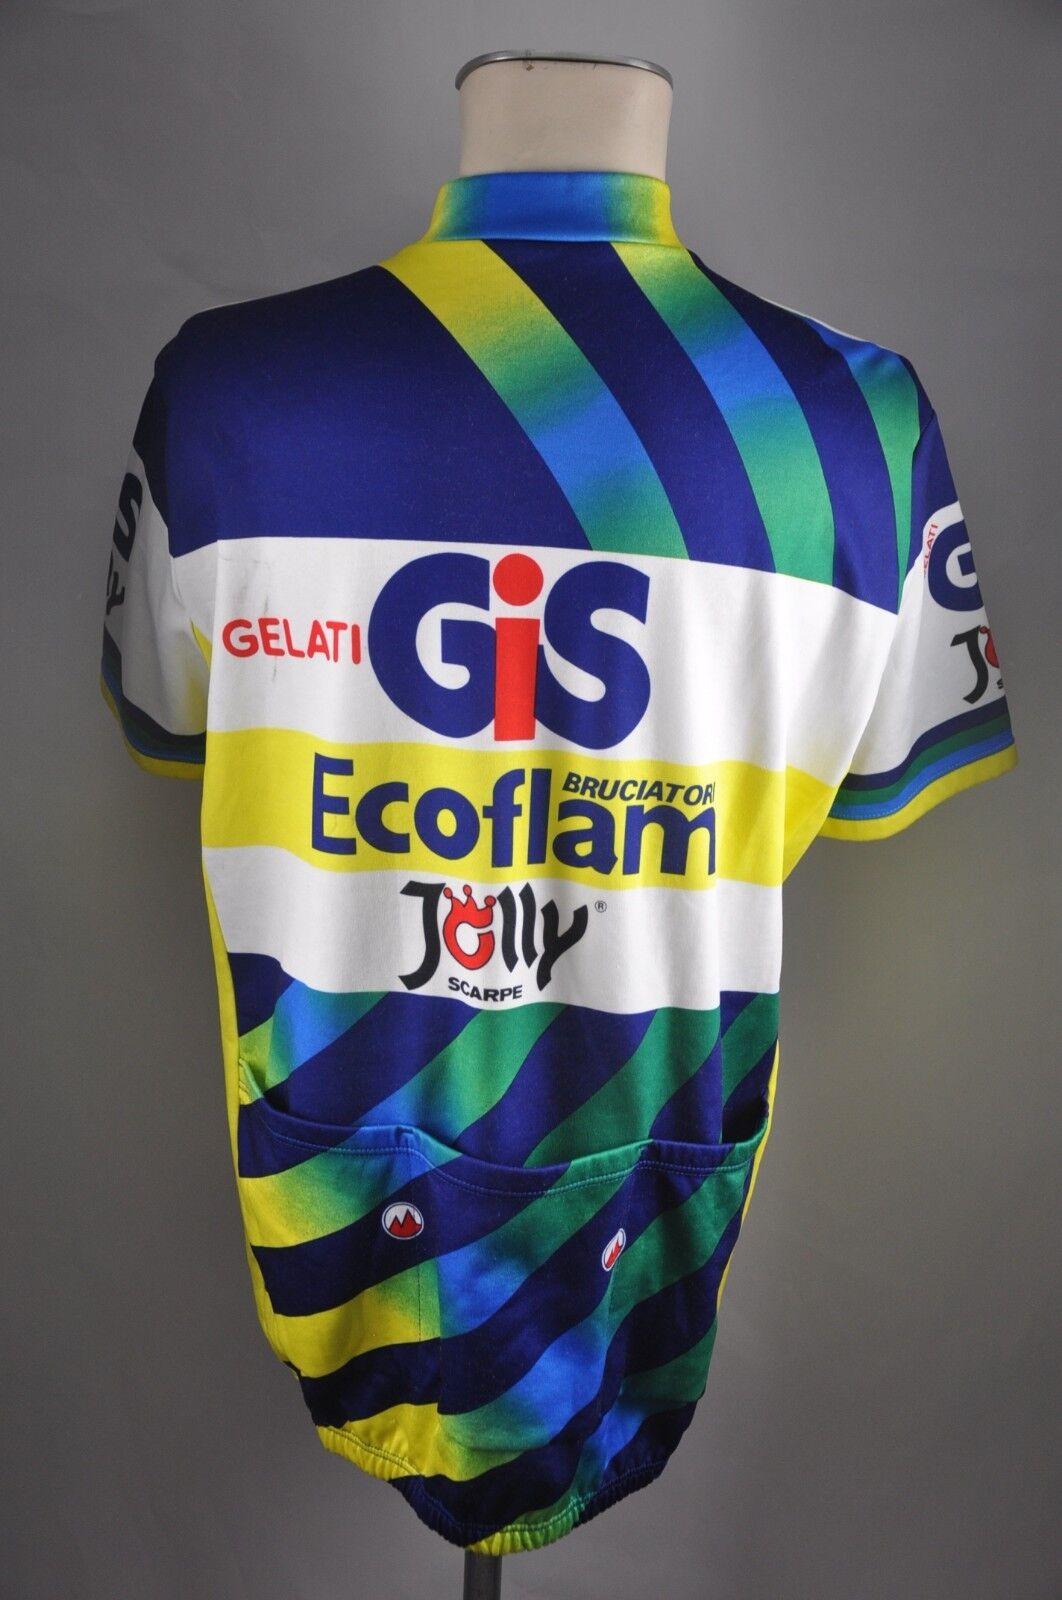 Gelati BW GIS Marilena Team jersey bike Gr 7 BW Gelati 57cm cycling Trikot KE7 a979cd